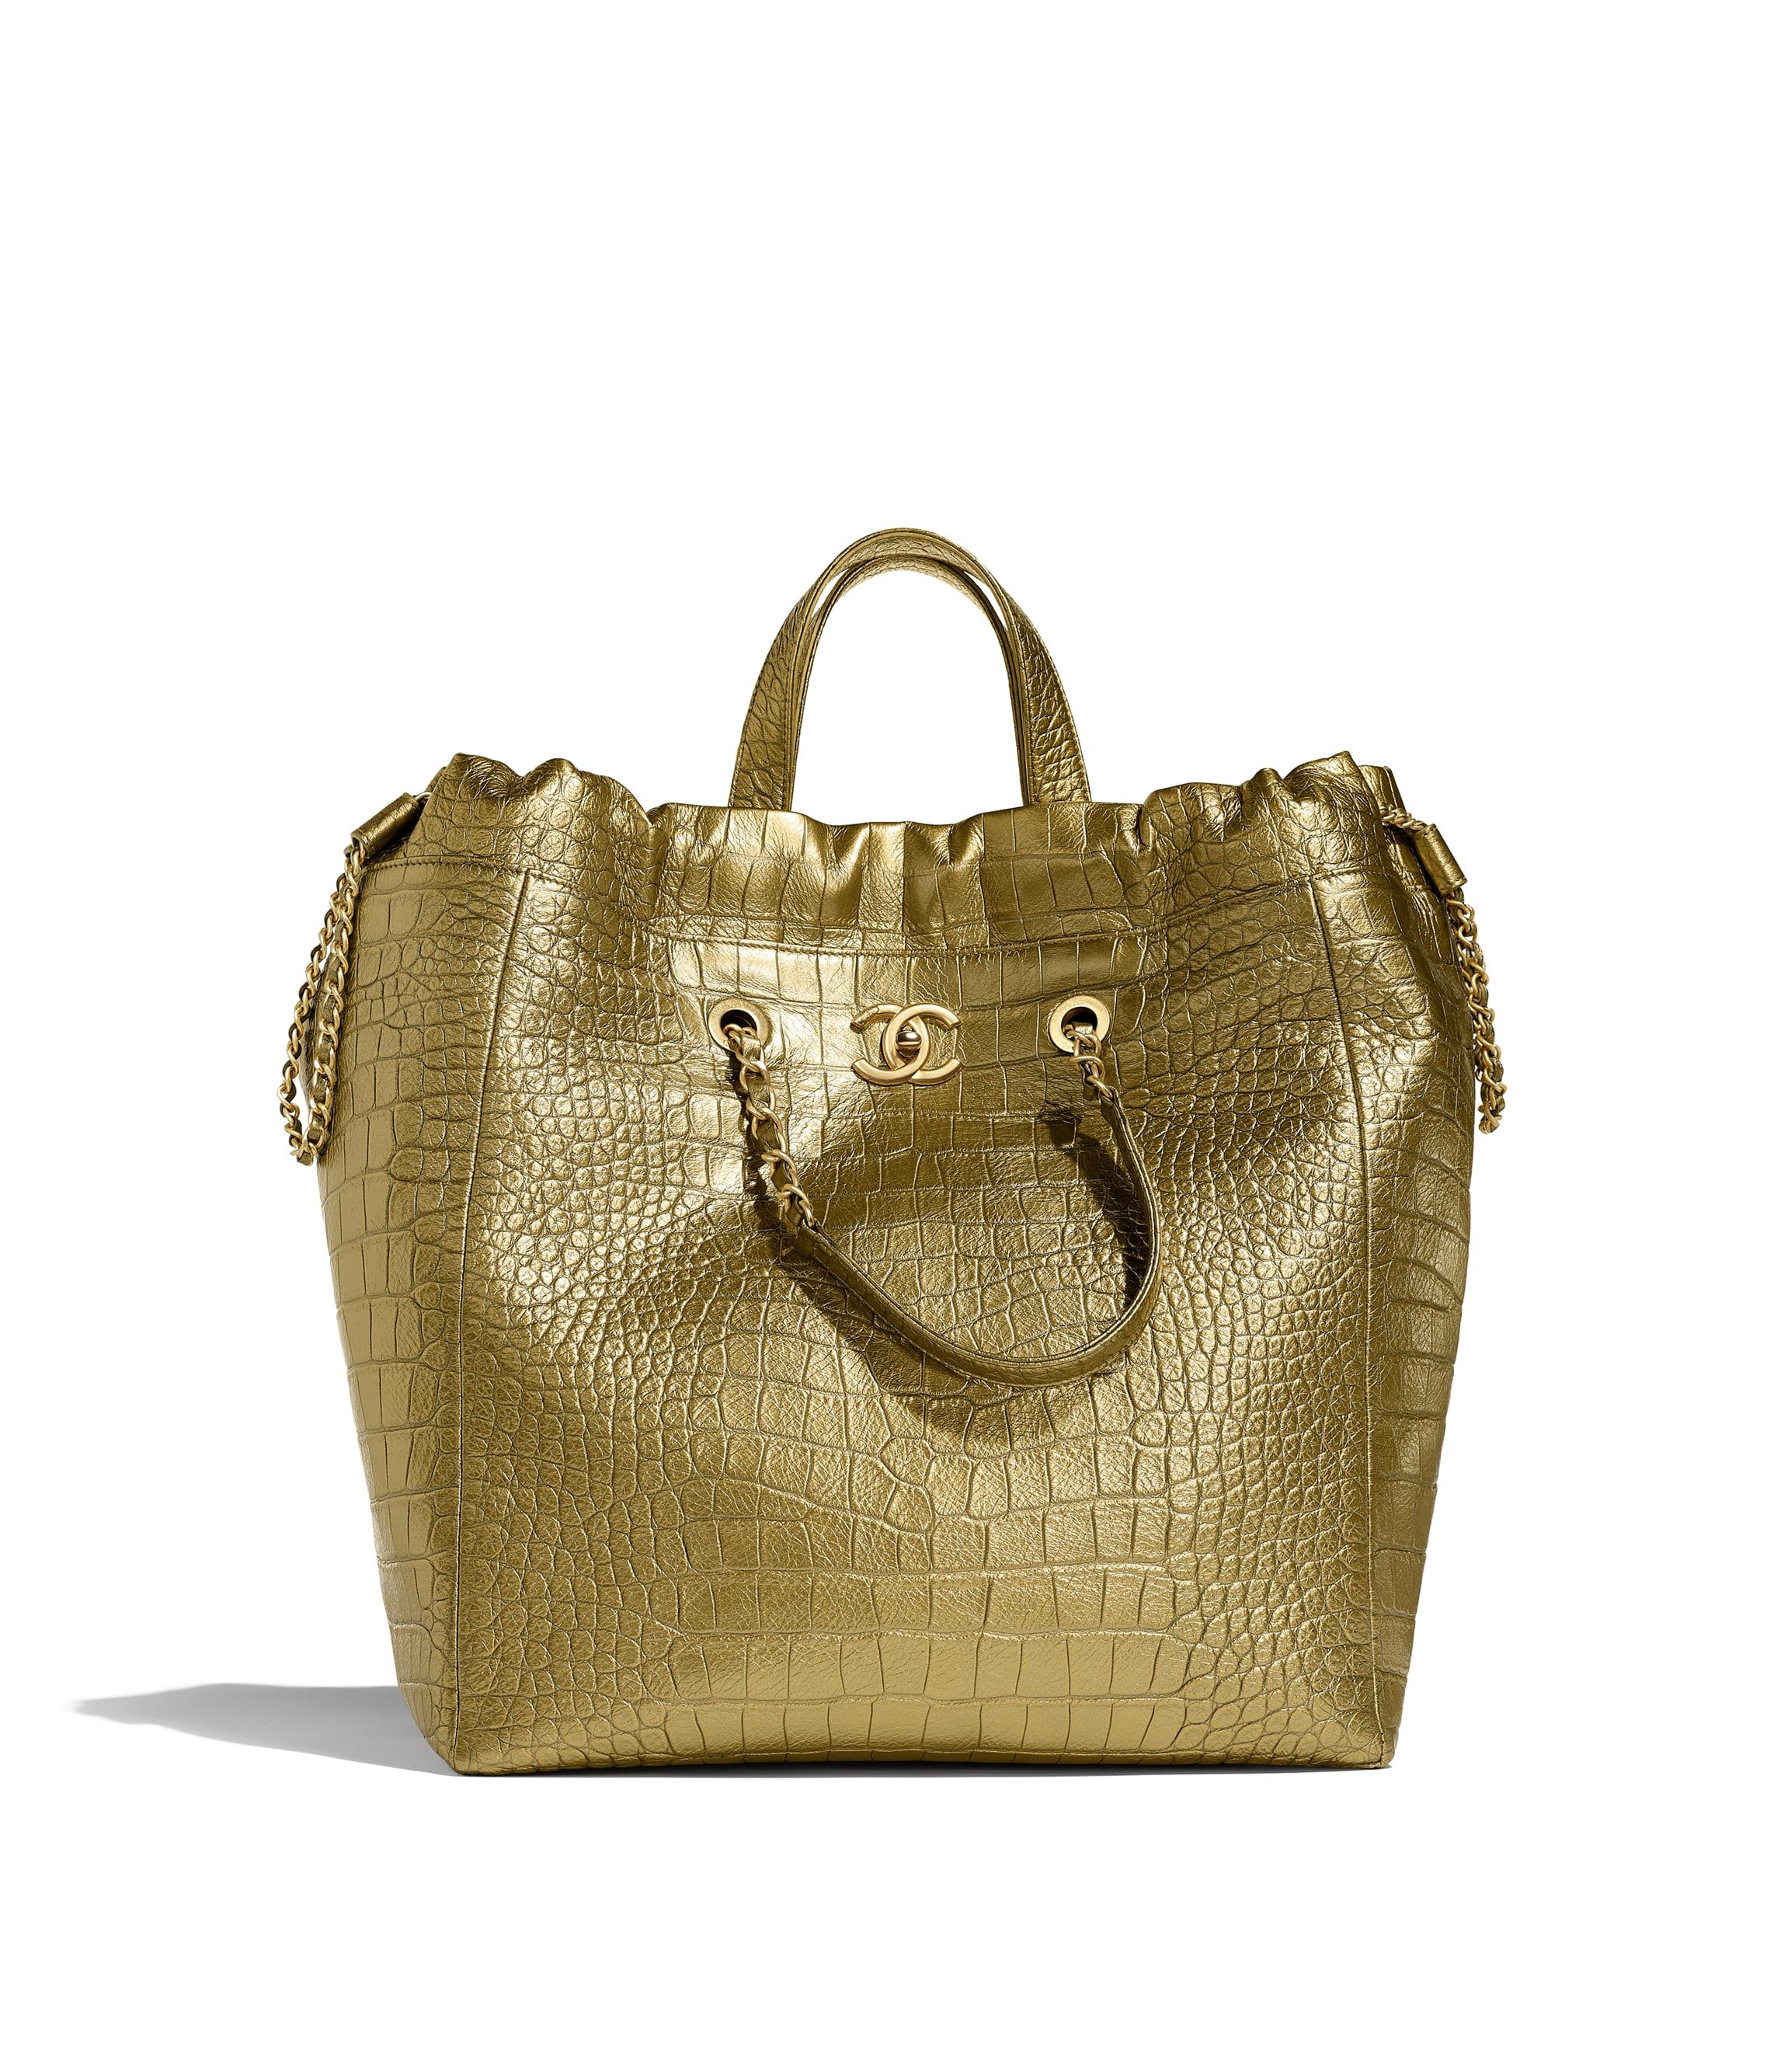 0e03354a56f4 Tote Bags - Handbags - CHANEL